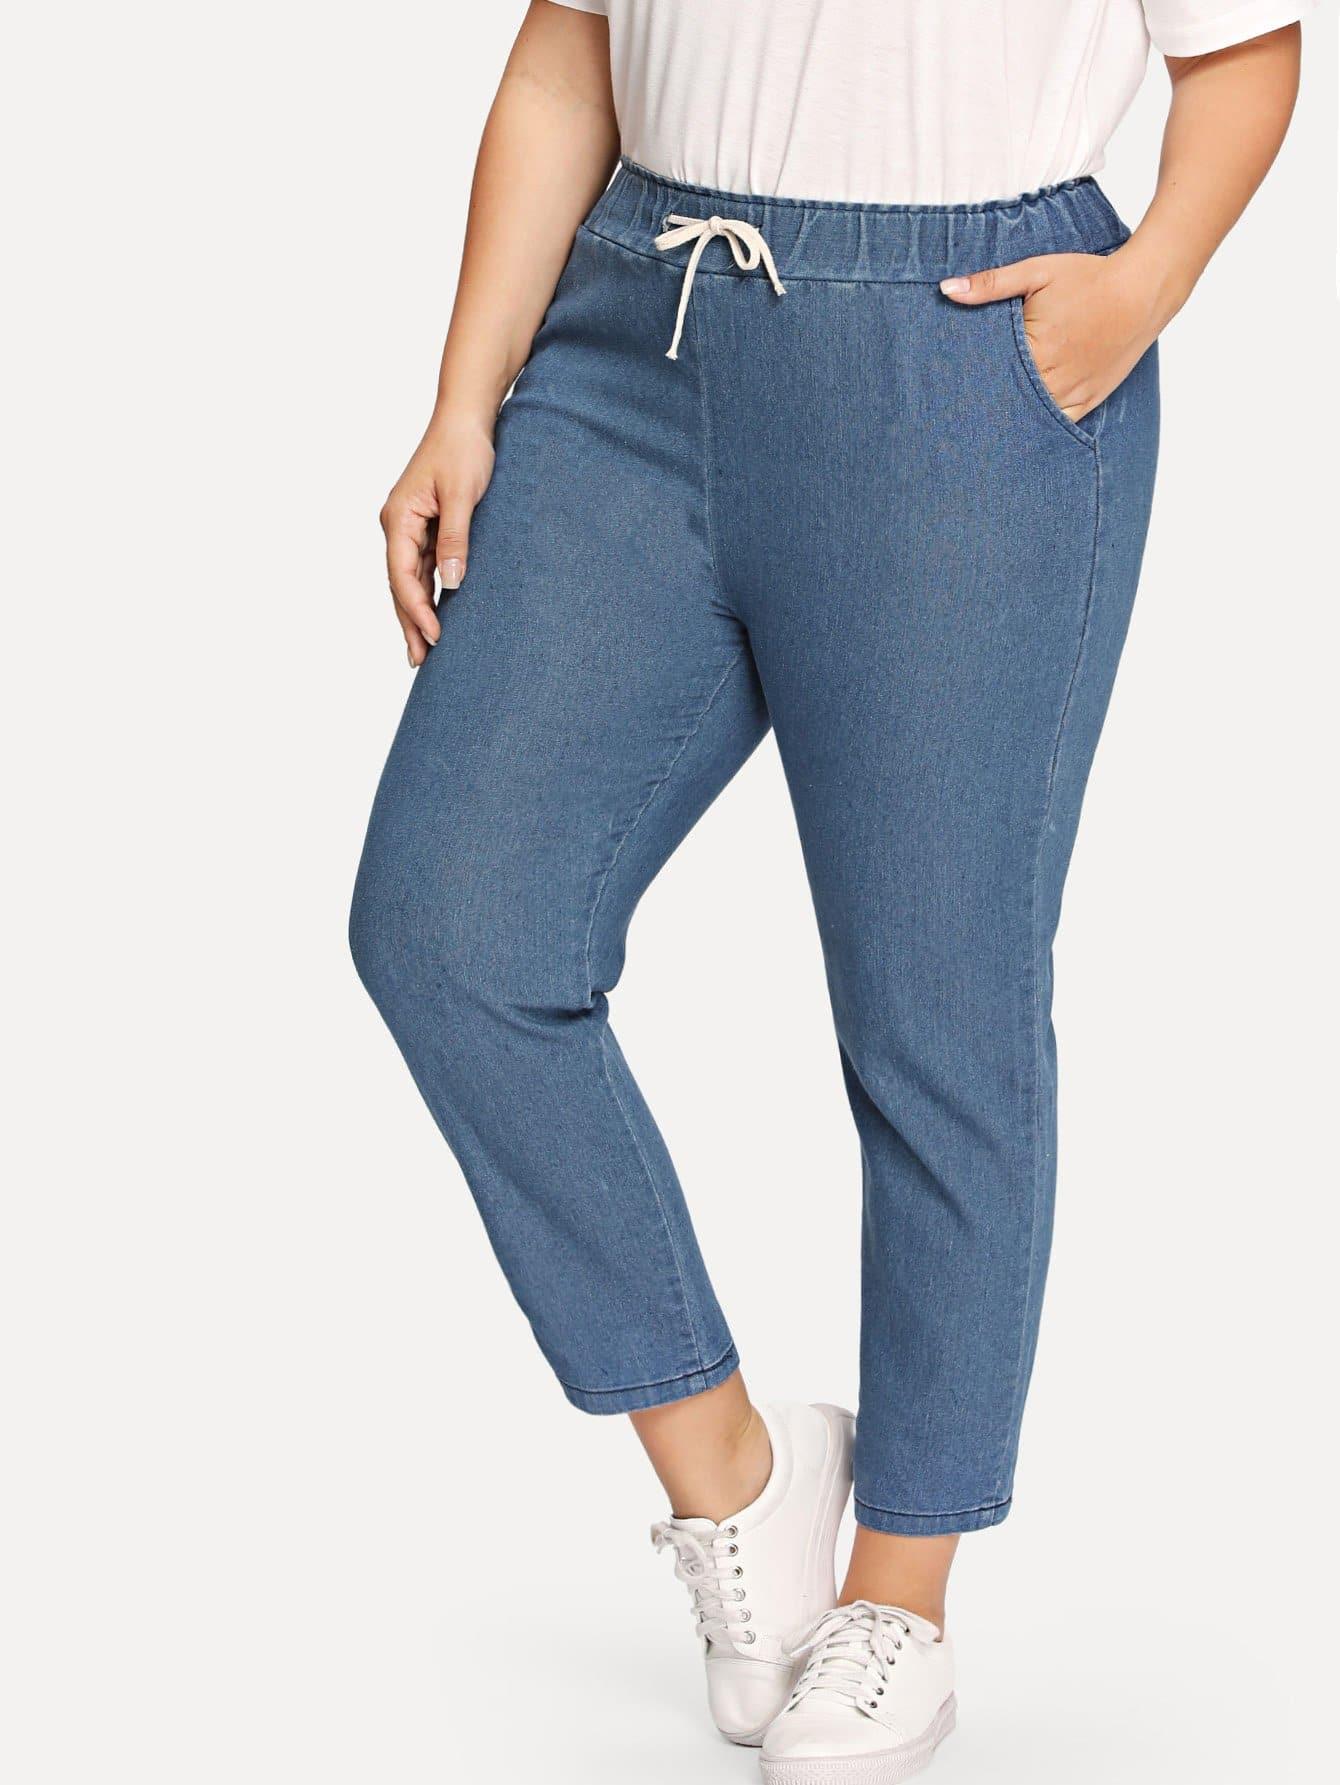 Elastic Waist Drawstring Jeans men elastic foot drawstring jeans